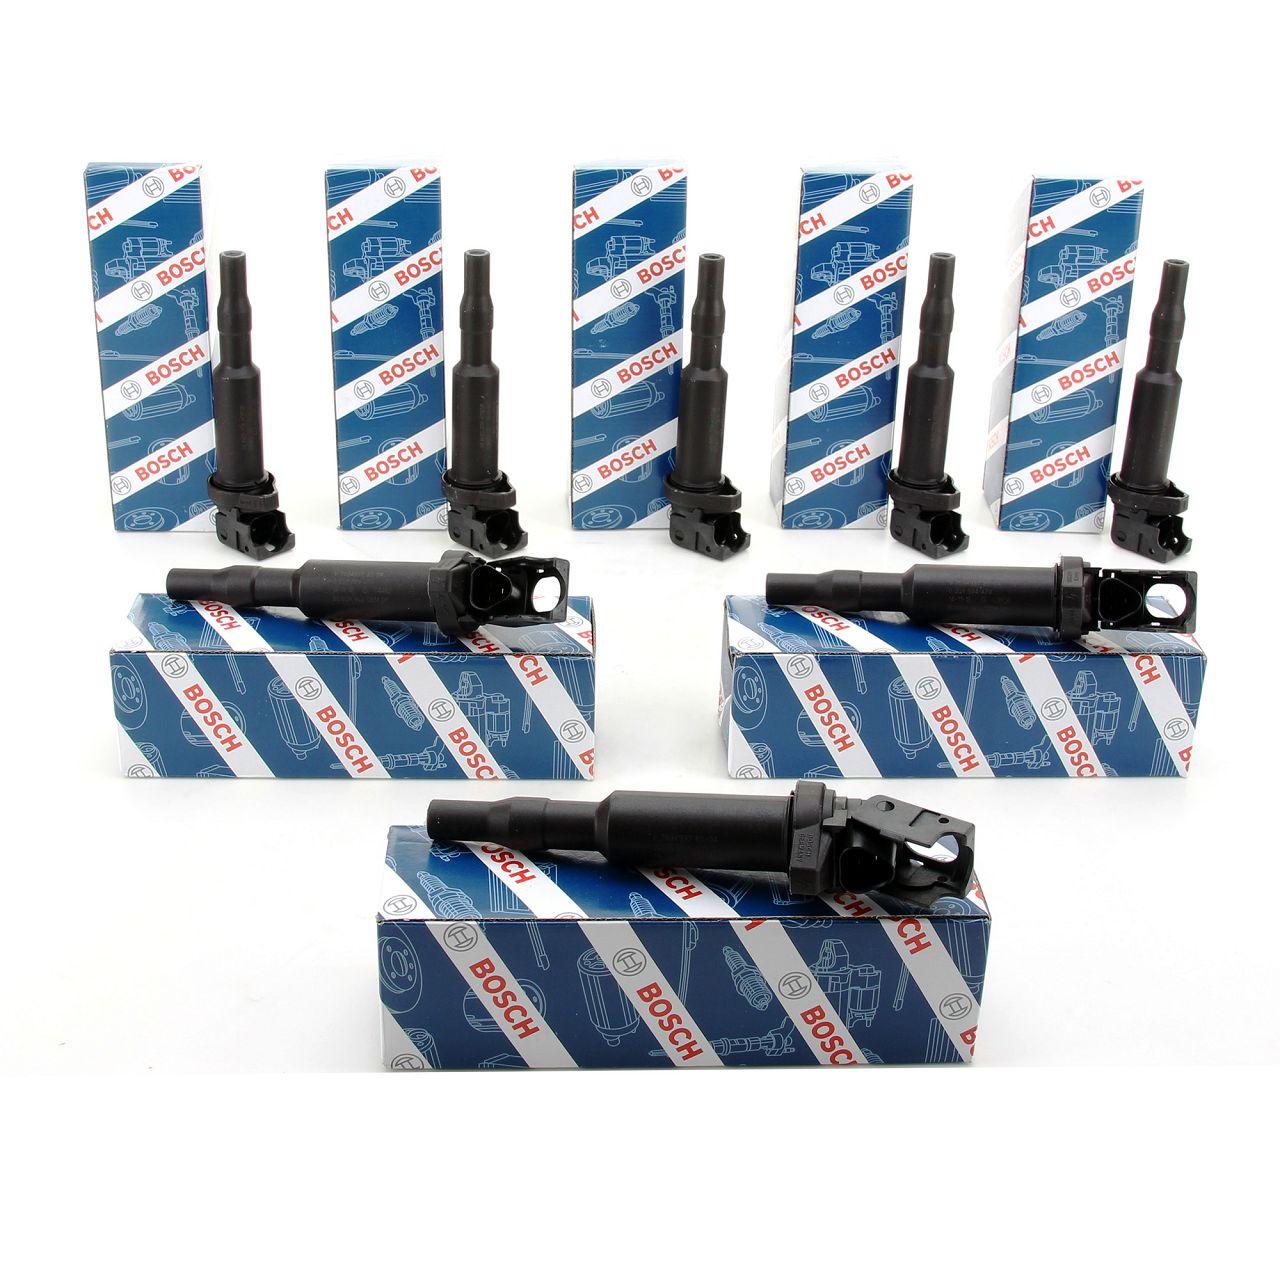 8x BOSCH 0221504470 Zündspule inkl. Zündkerzenstecker BMW E81/87 E46 E90 E60/61 F10 X3 X5